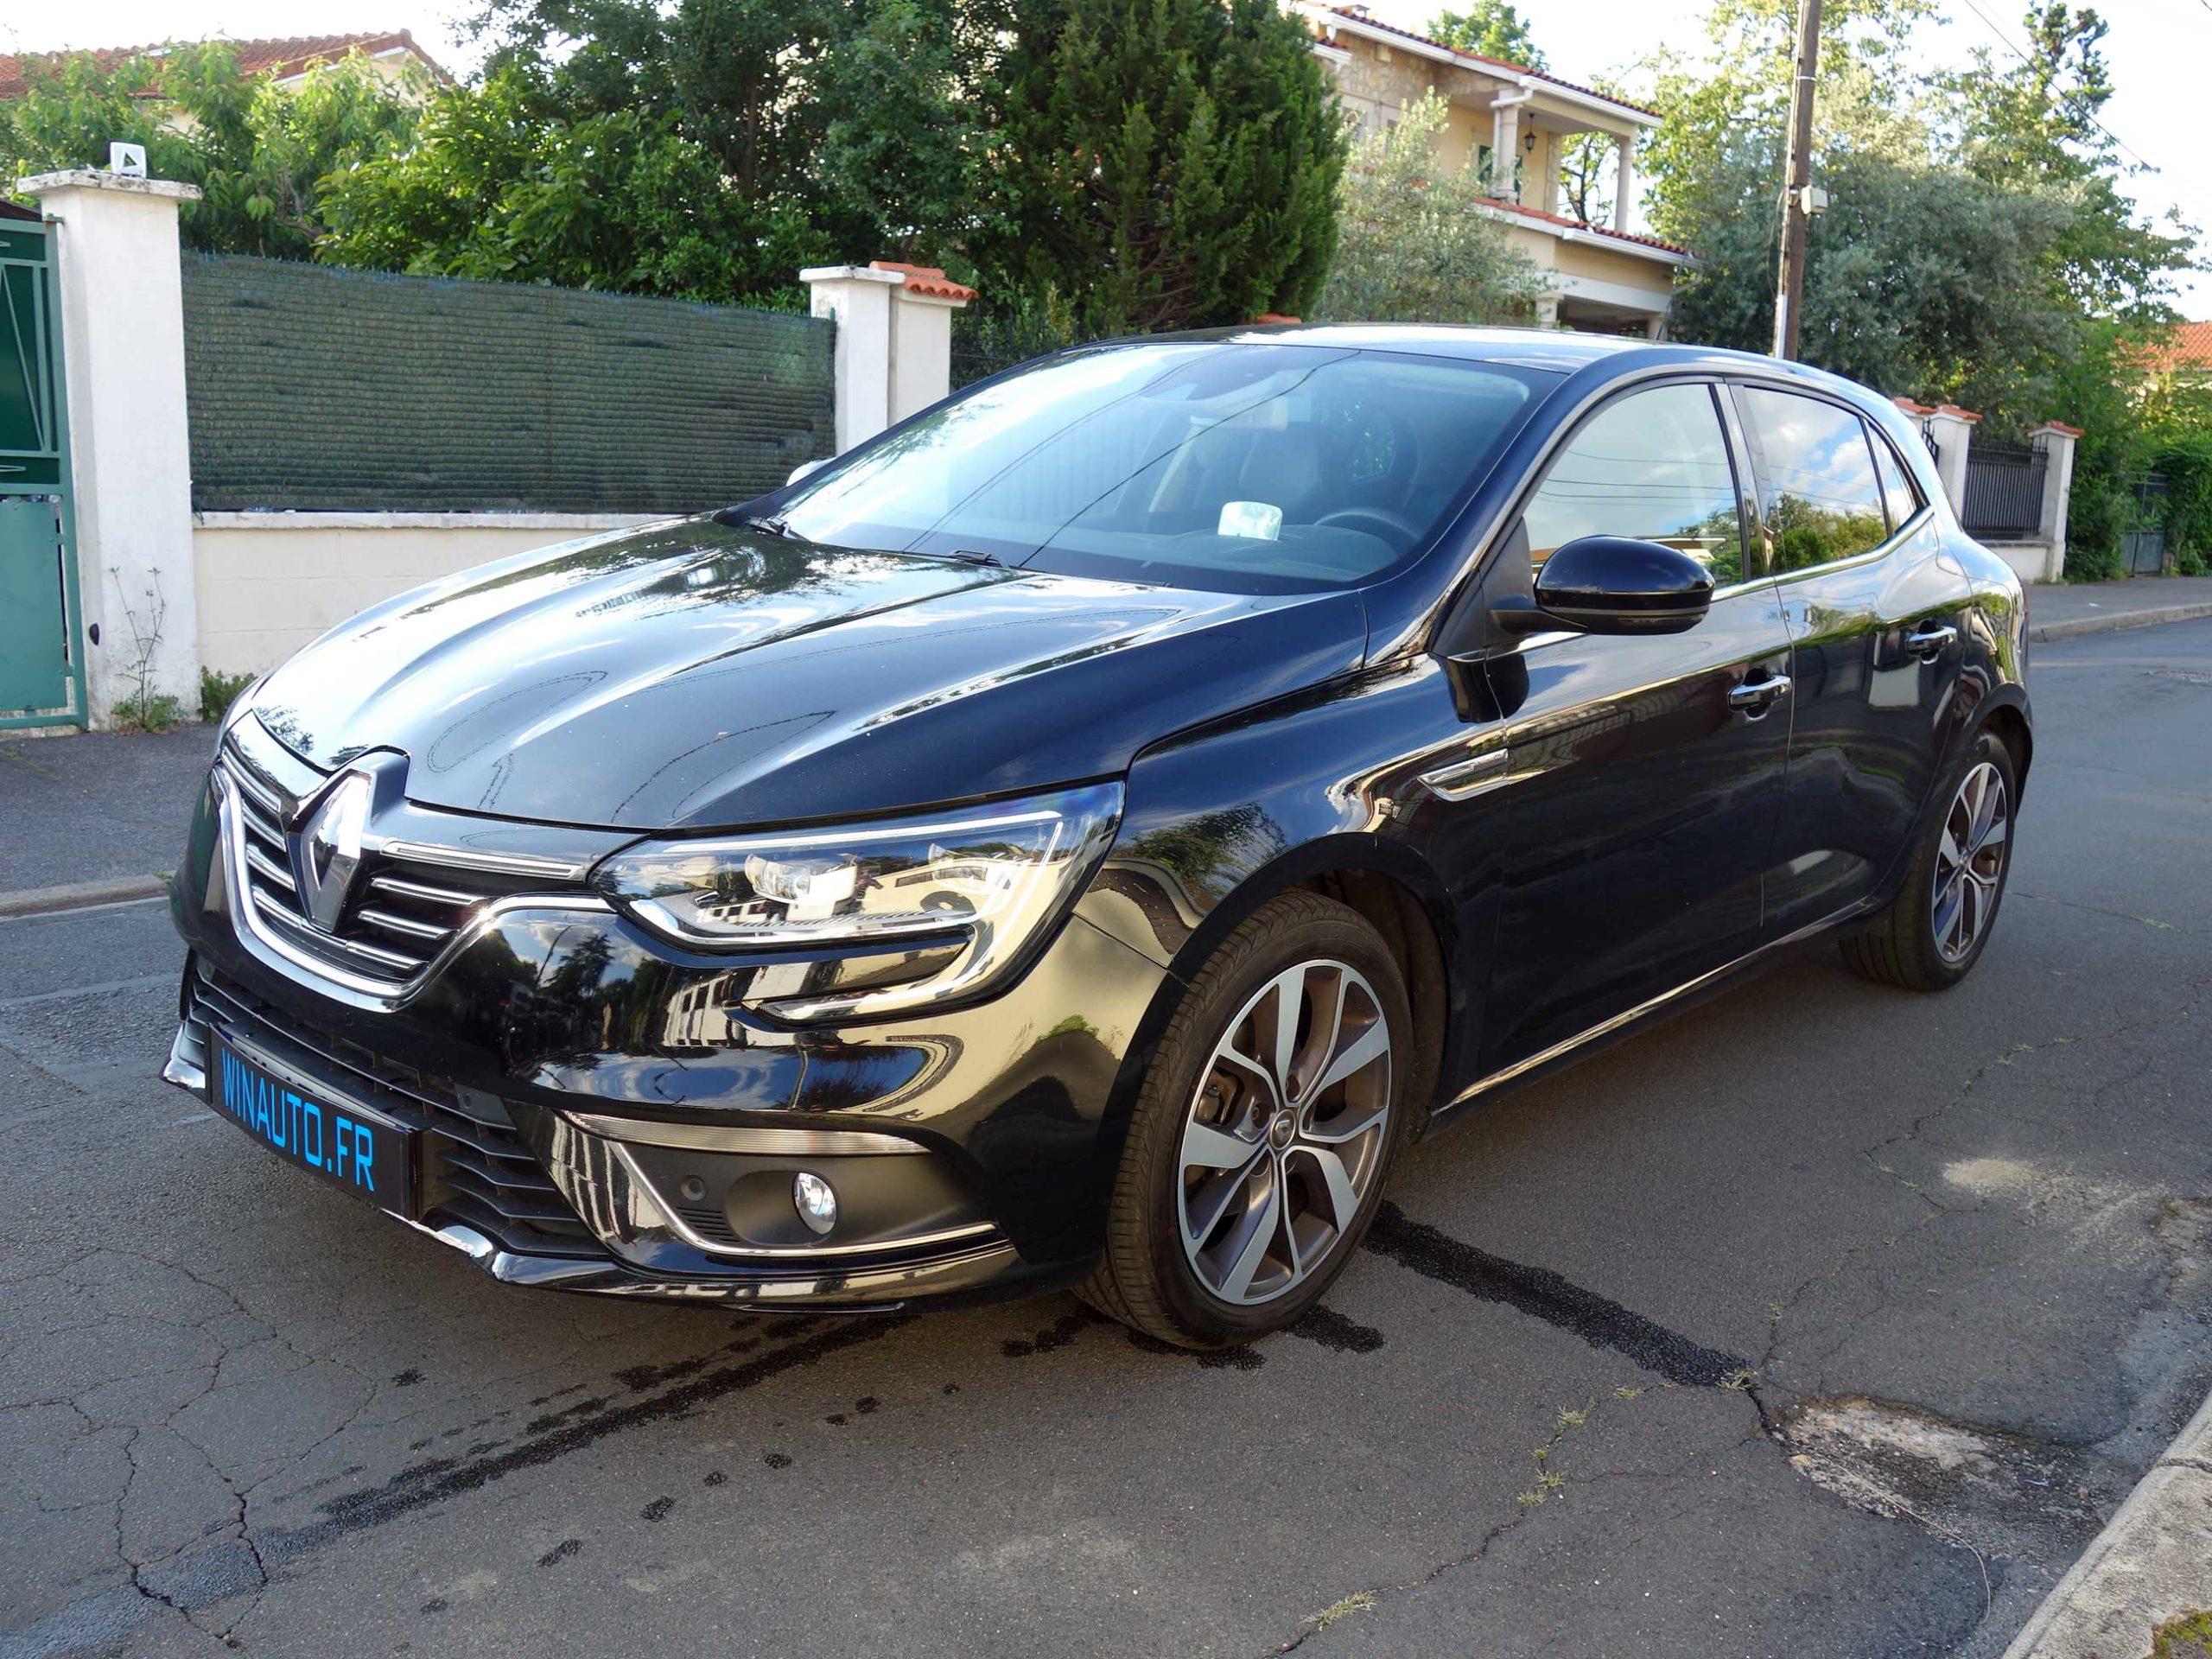 Renault Megane dCi 110ch Intens